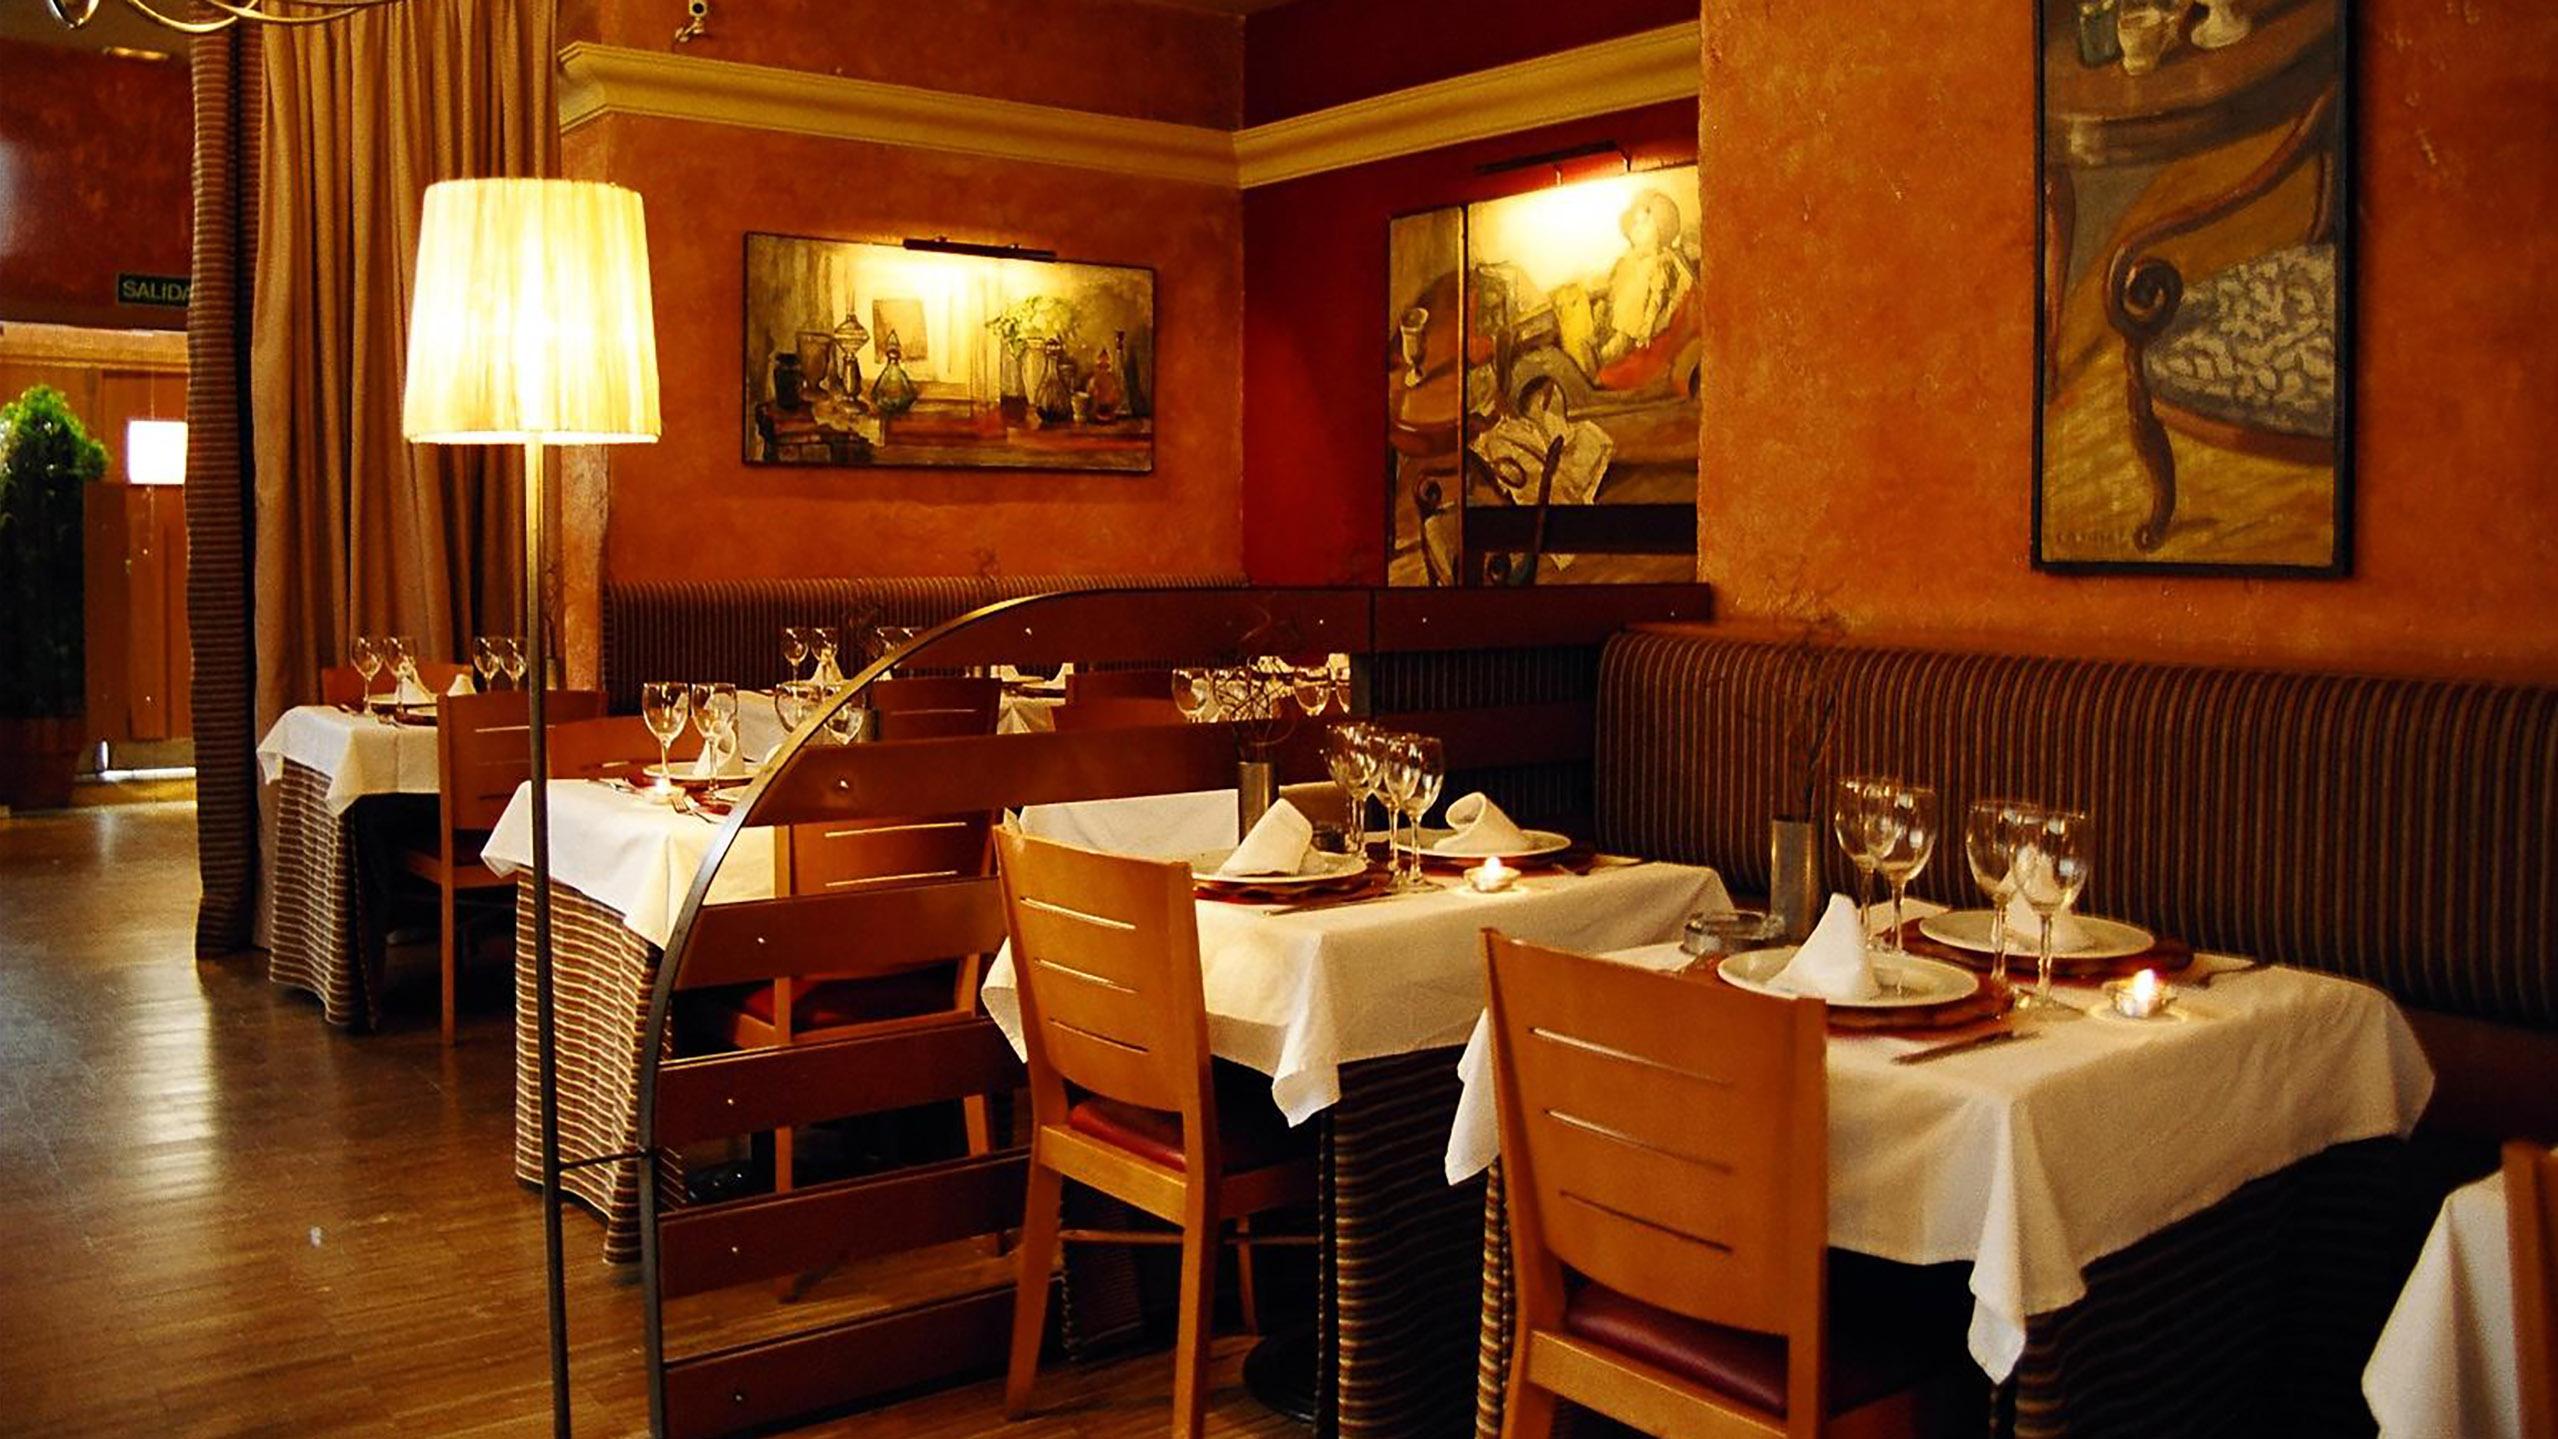 cocina de autor, restaurante, fine dining